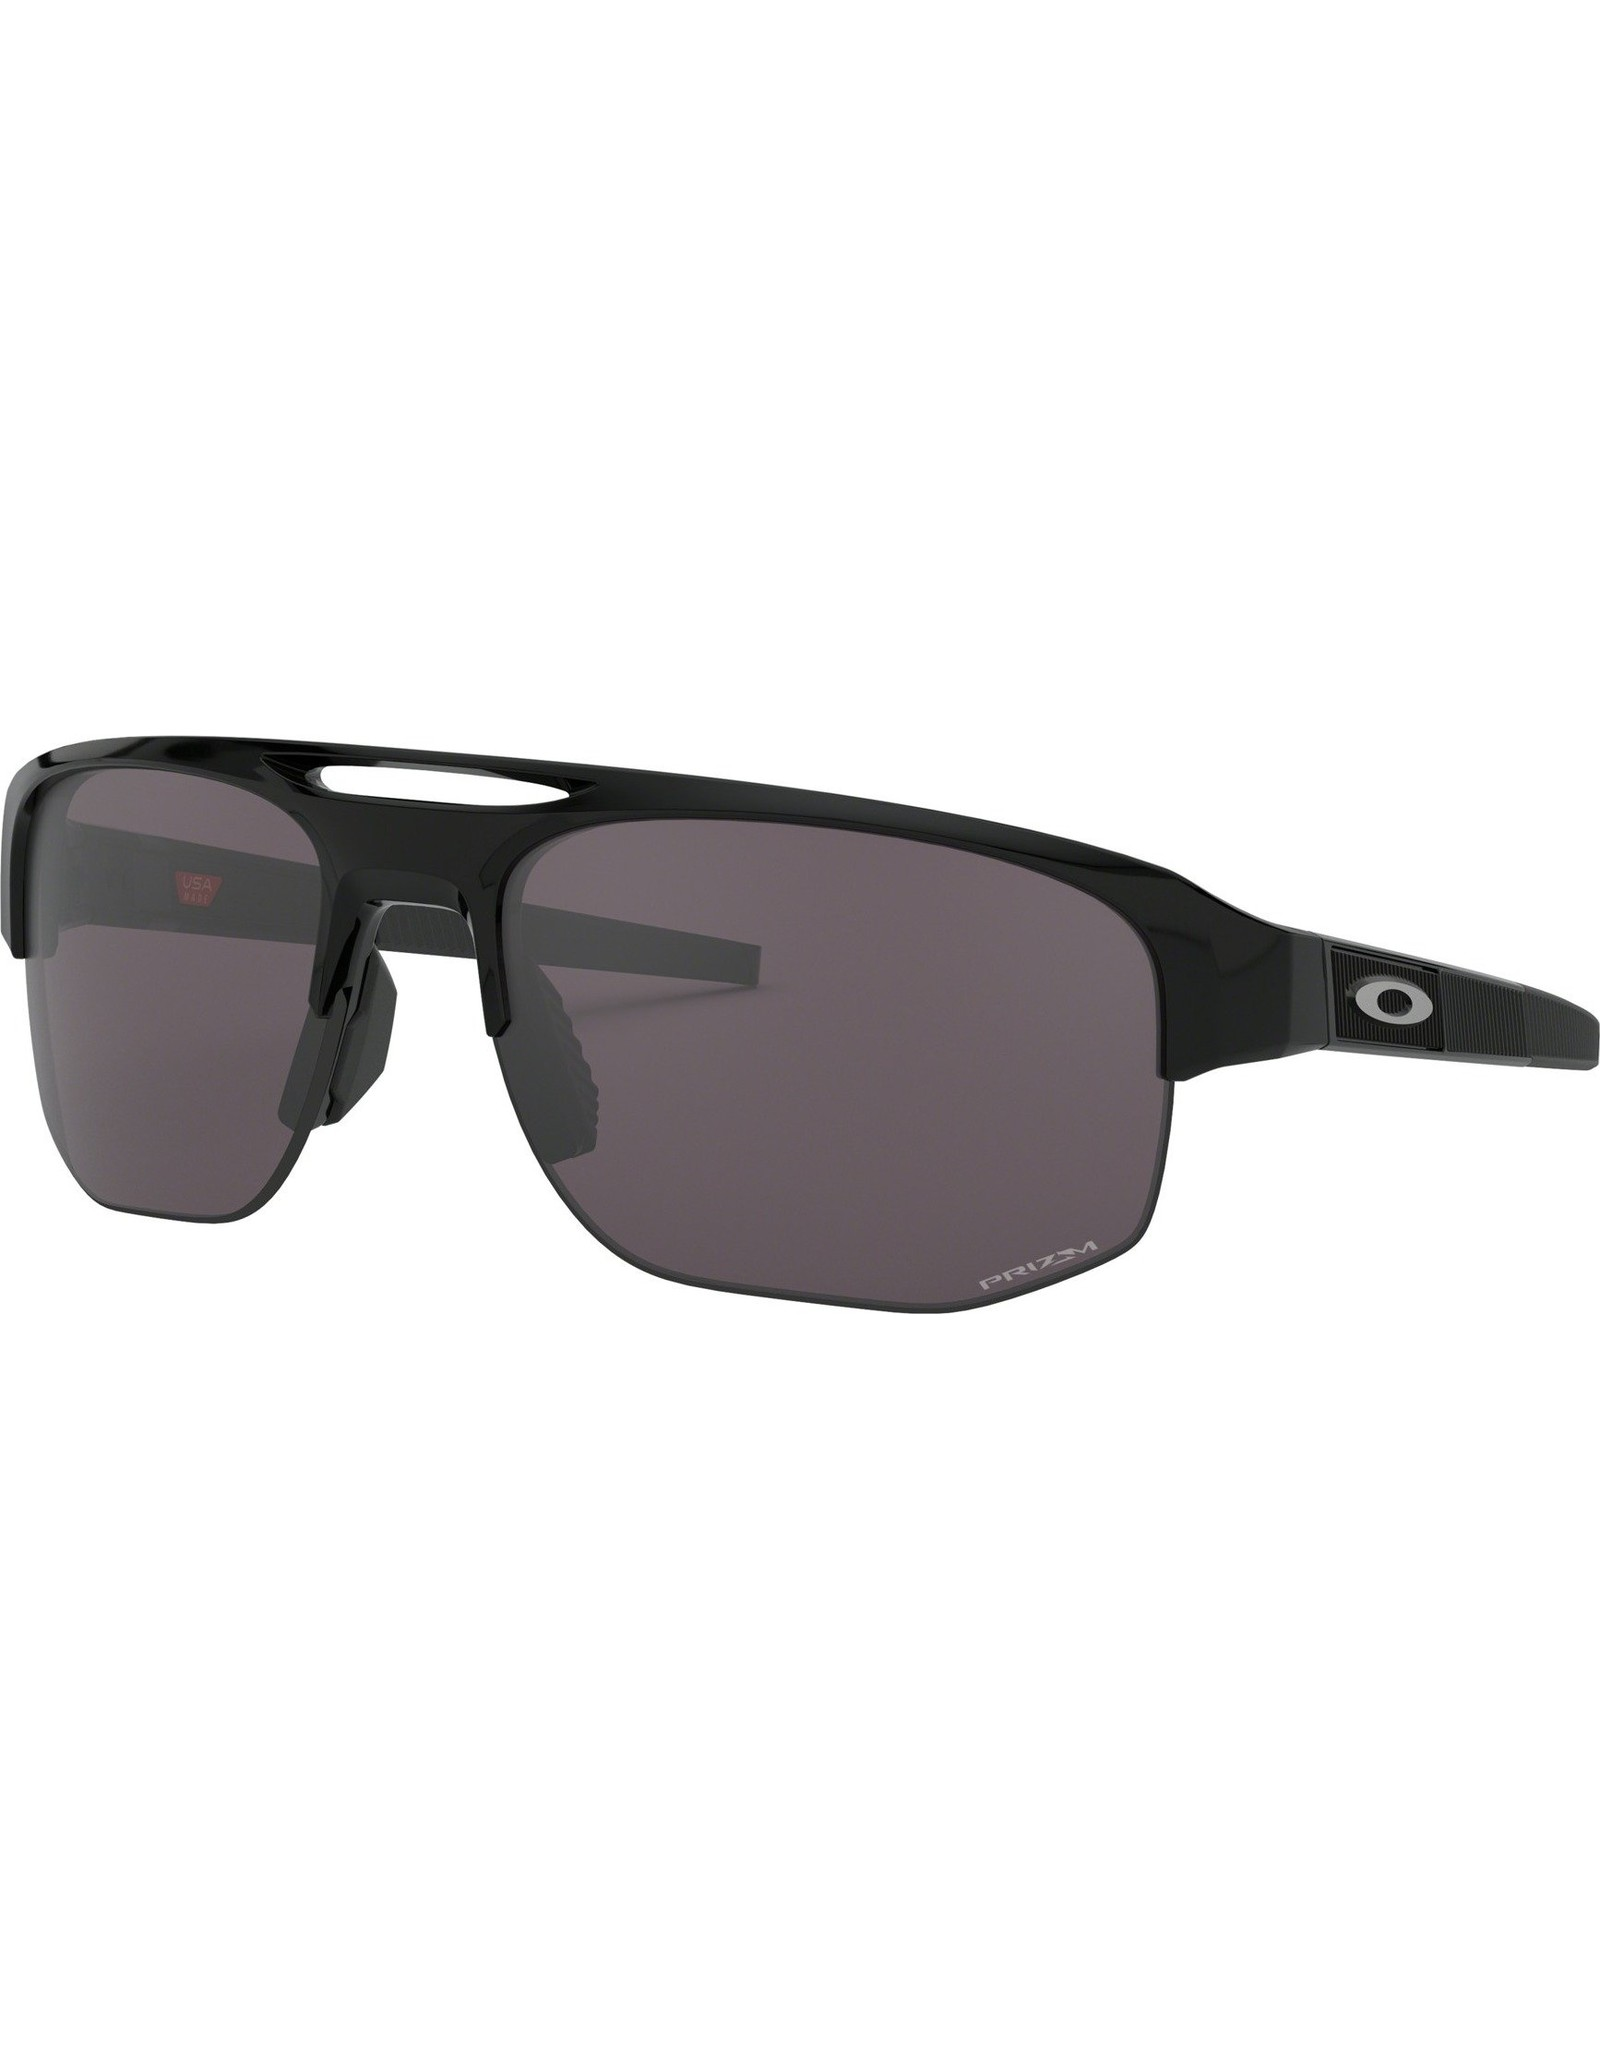 Oakley Oakley Mens sunglasses MERCENARY polished black w/ prizm grey